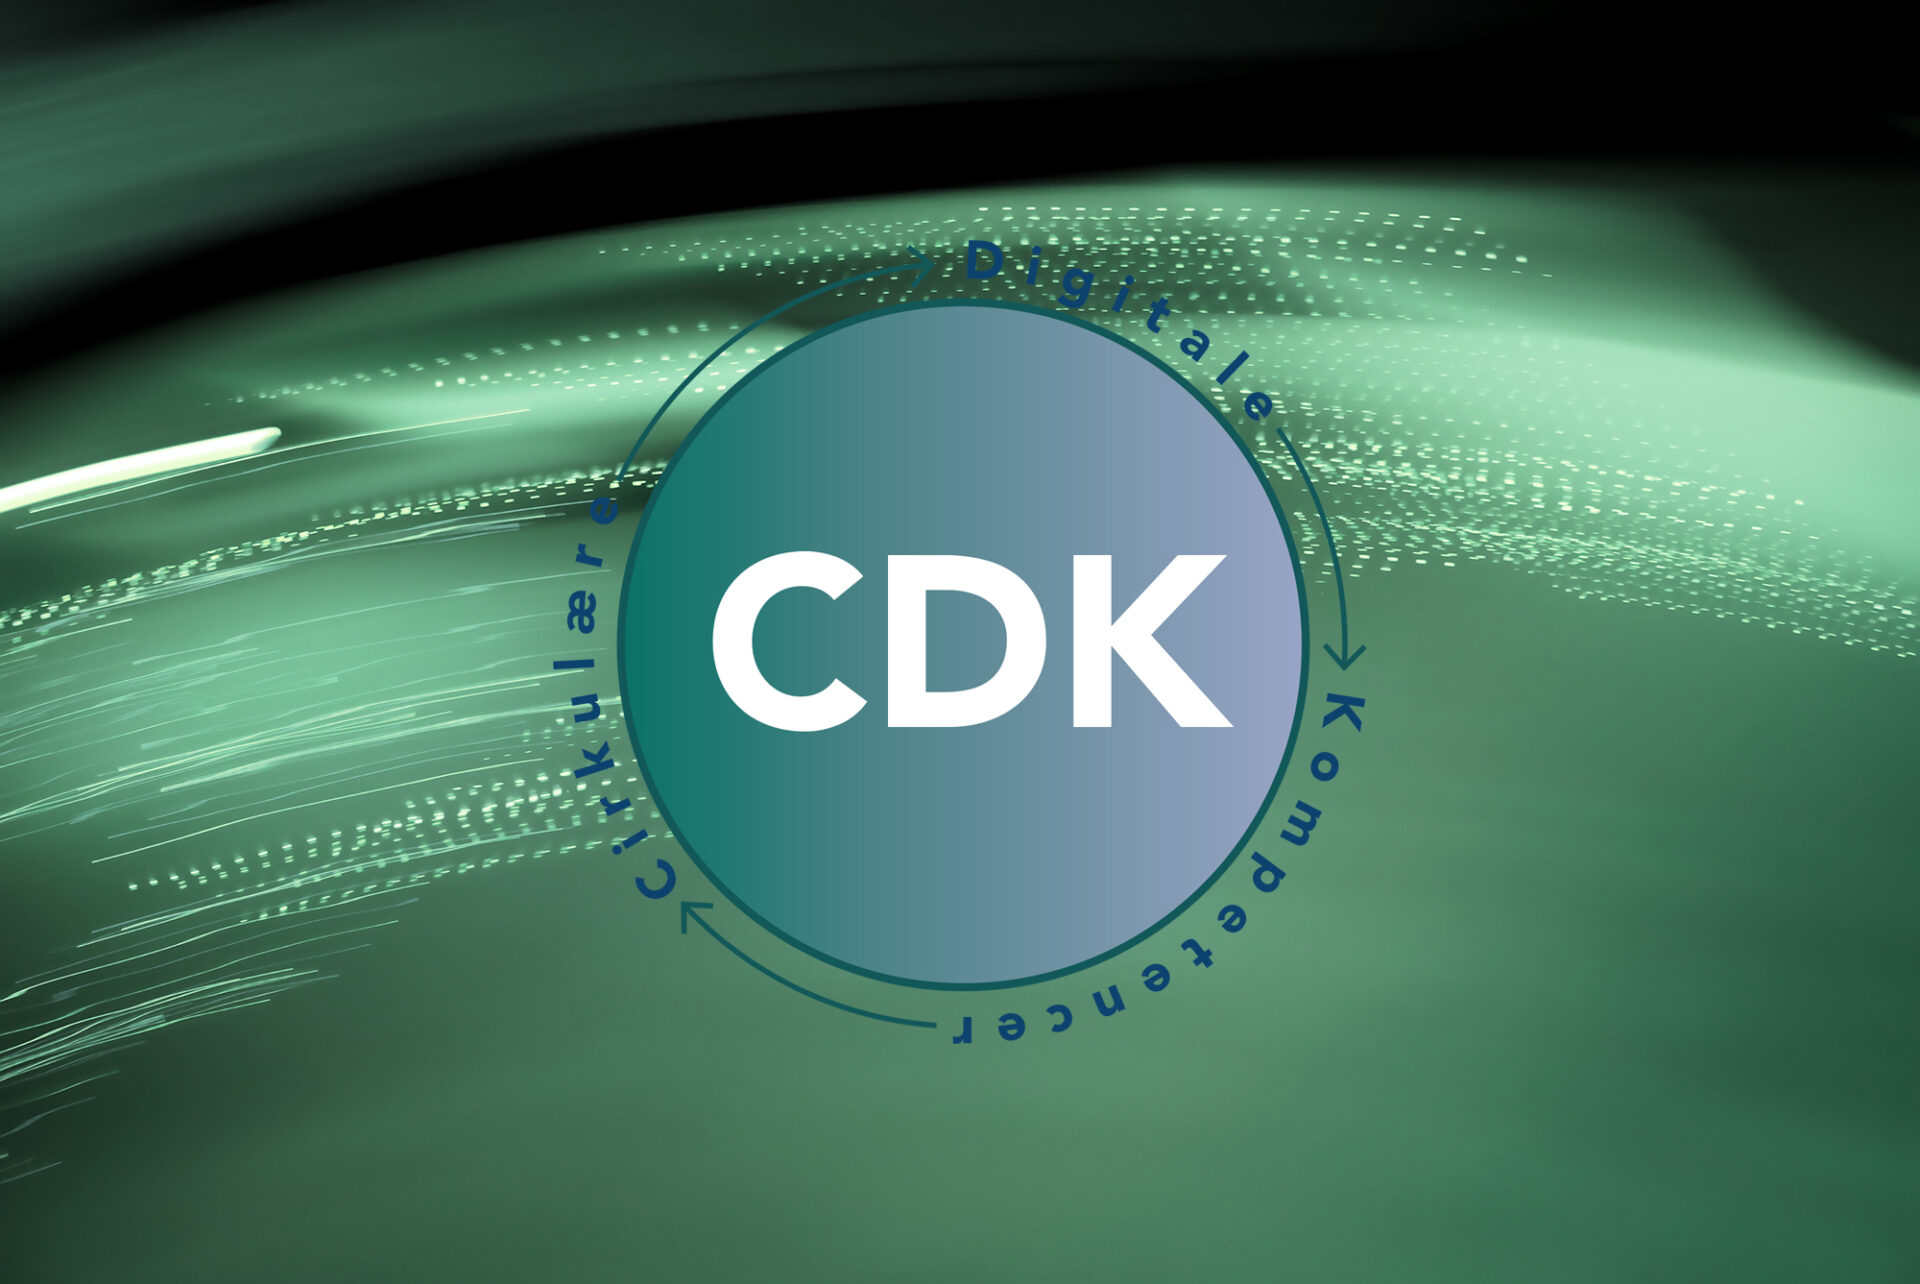 Cirkulære Digitale Kompetencer